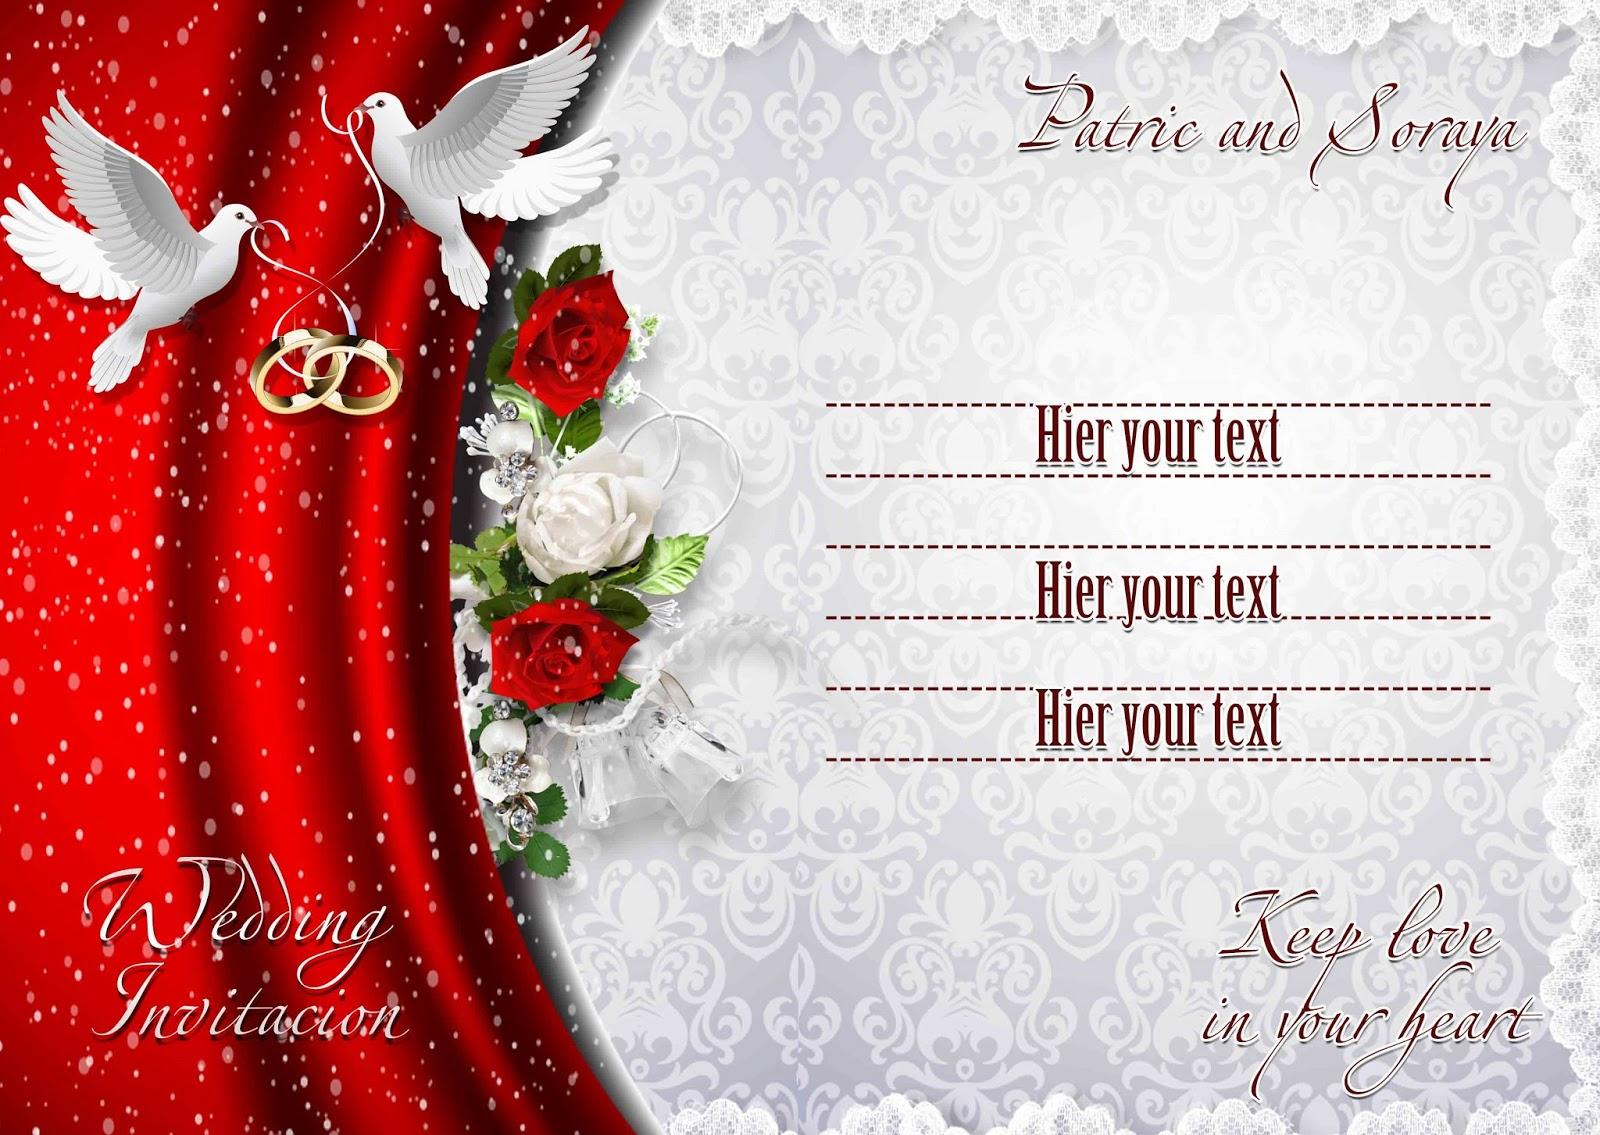 photoshop wedding invitation template